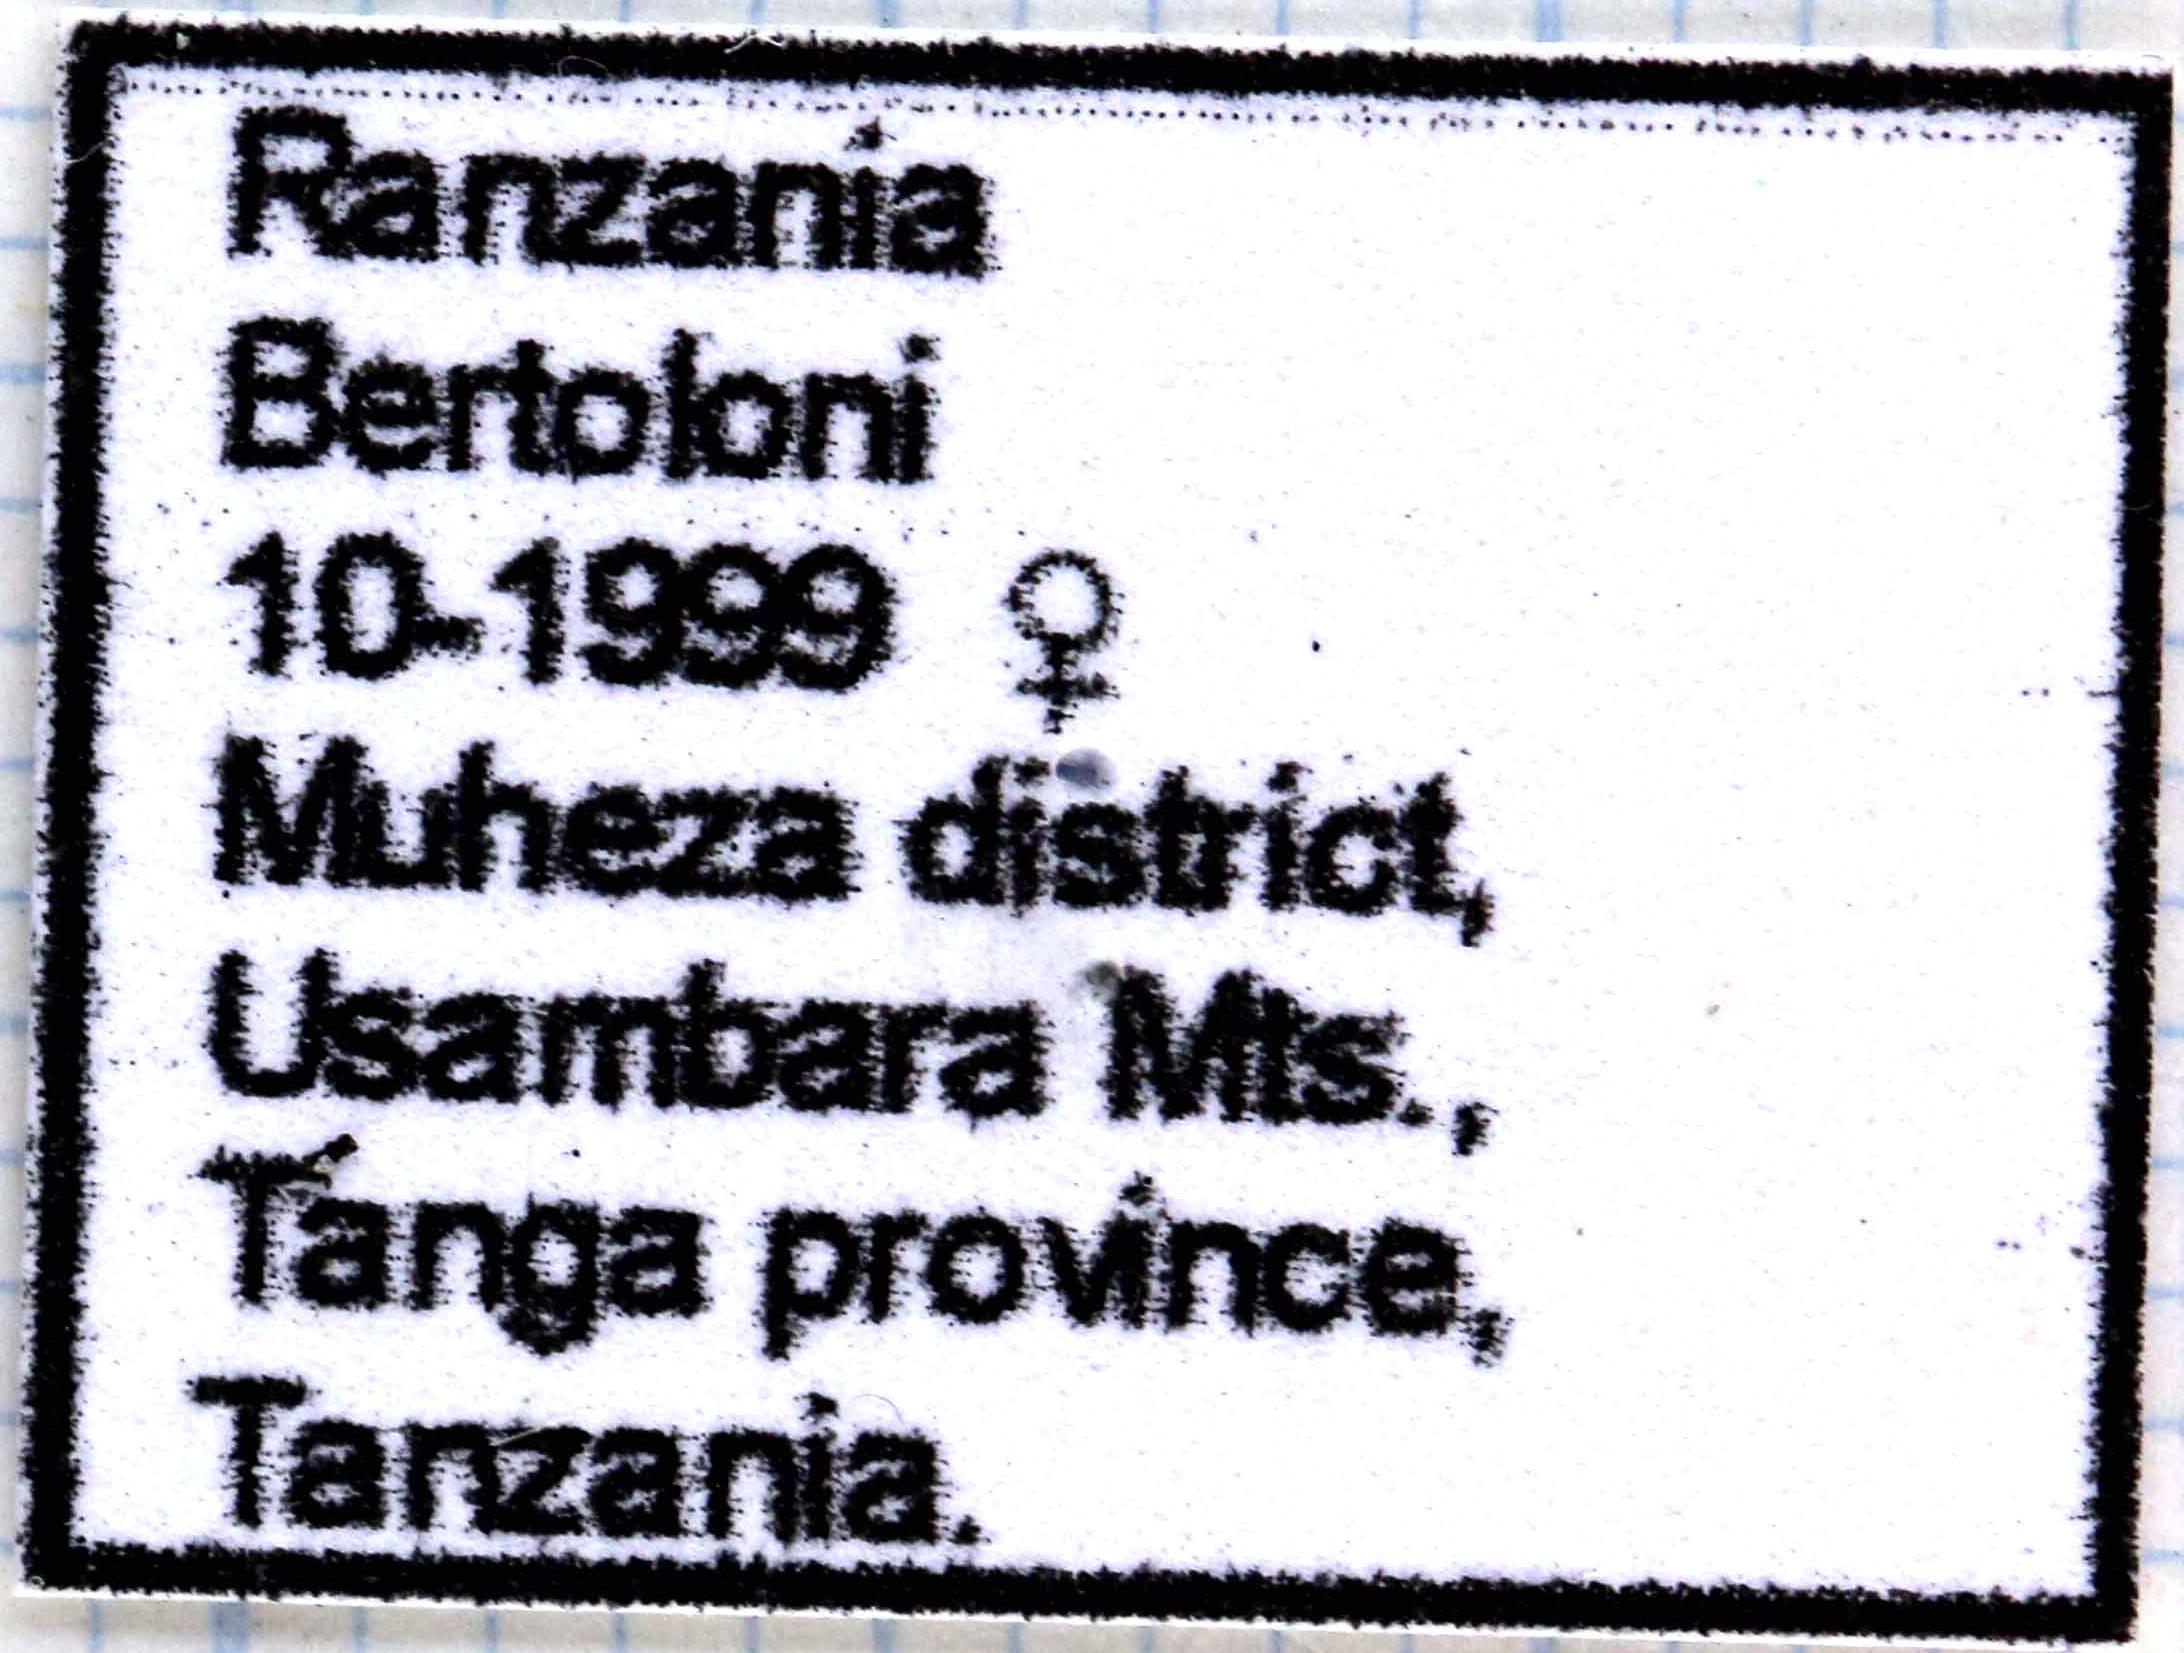 Rhamphorrhina bertolonii 64353 female.jpg